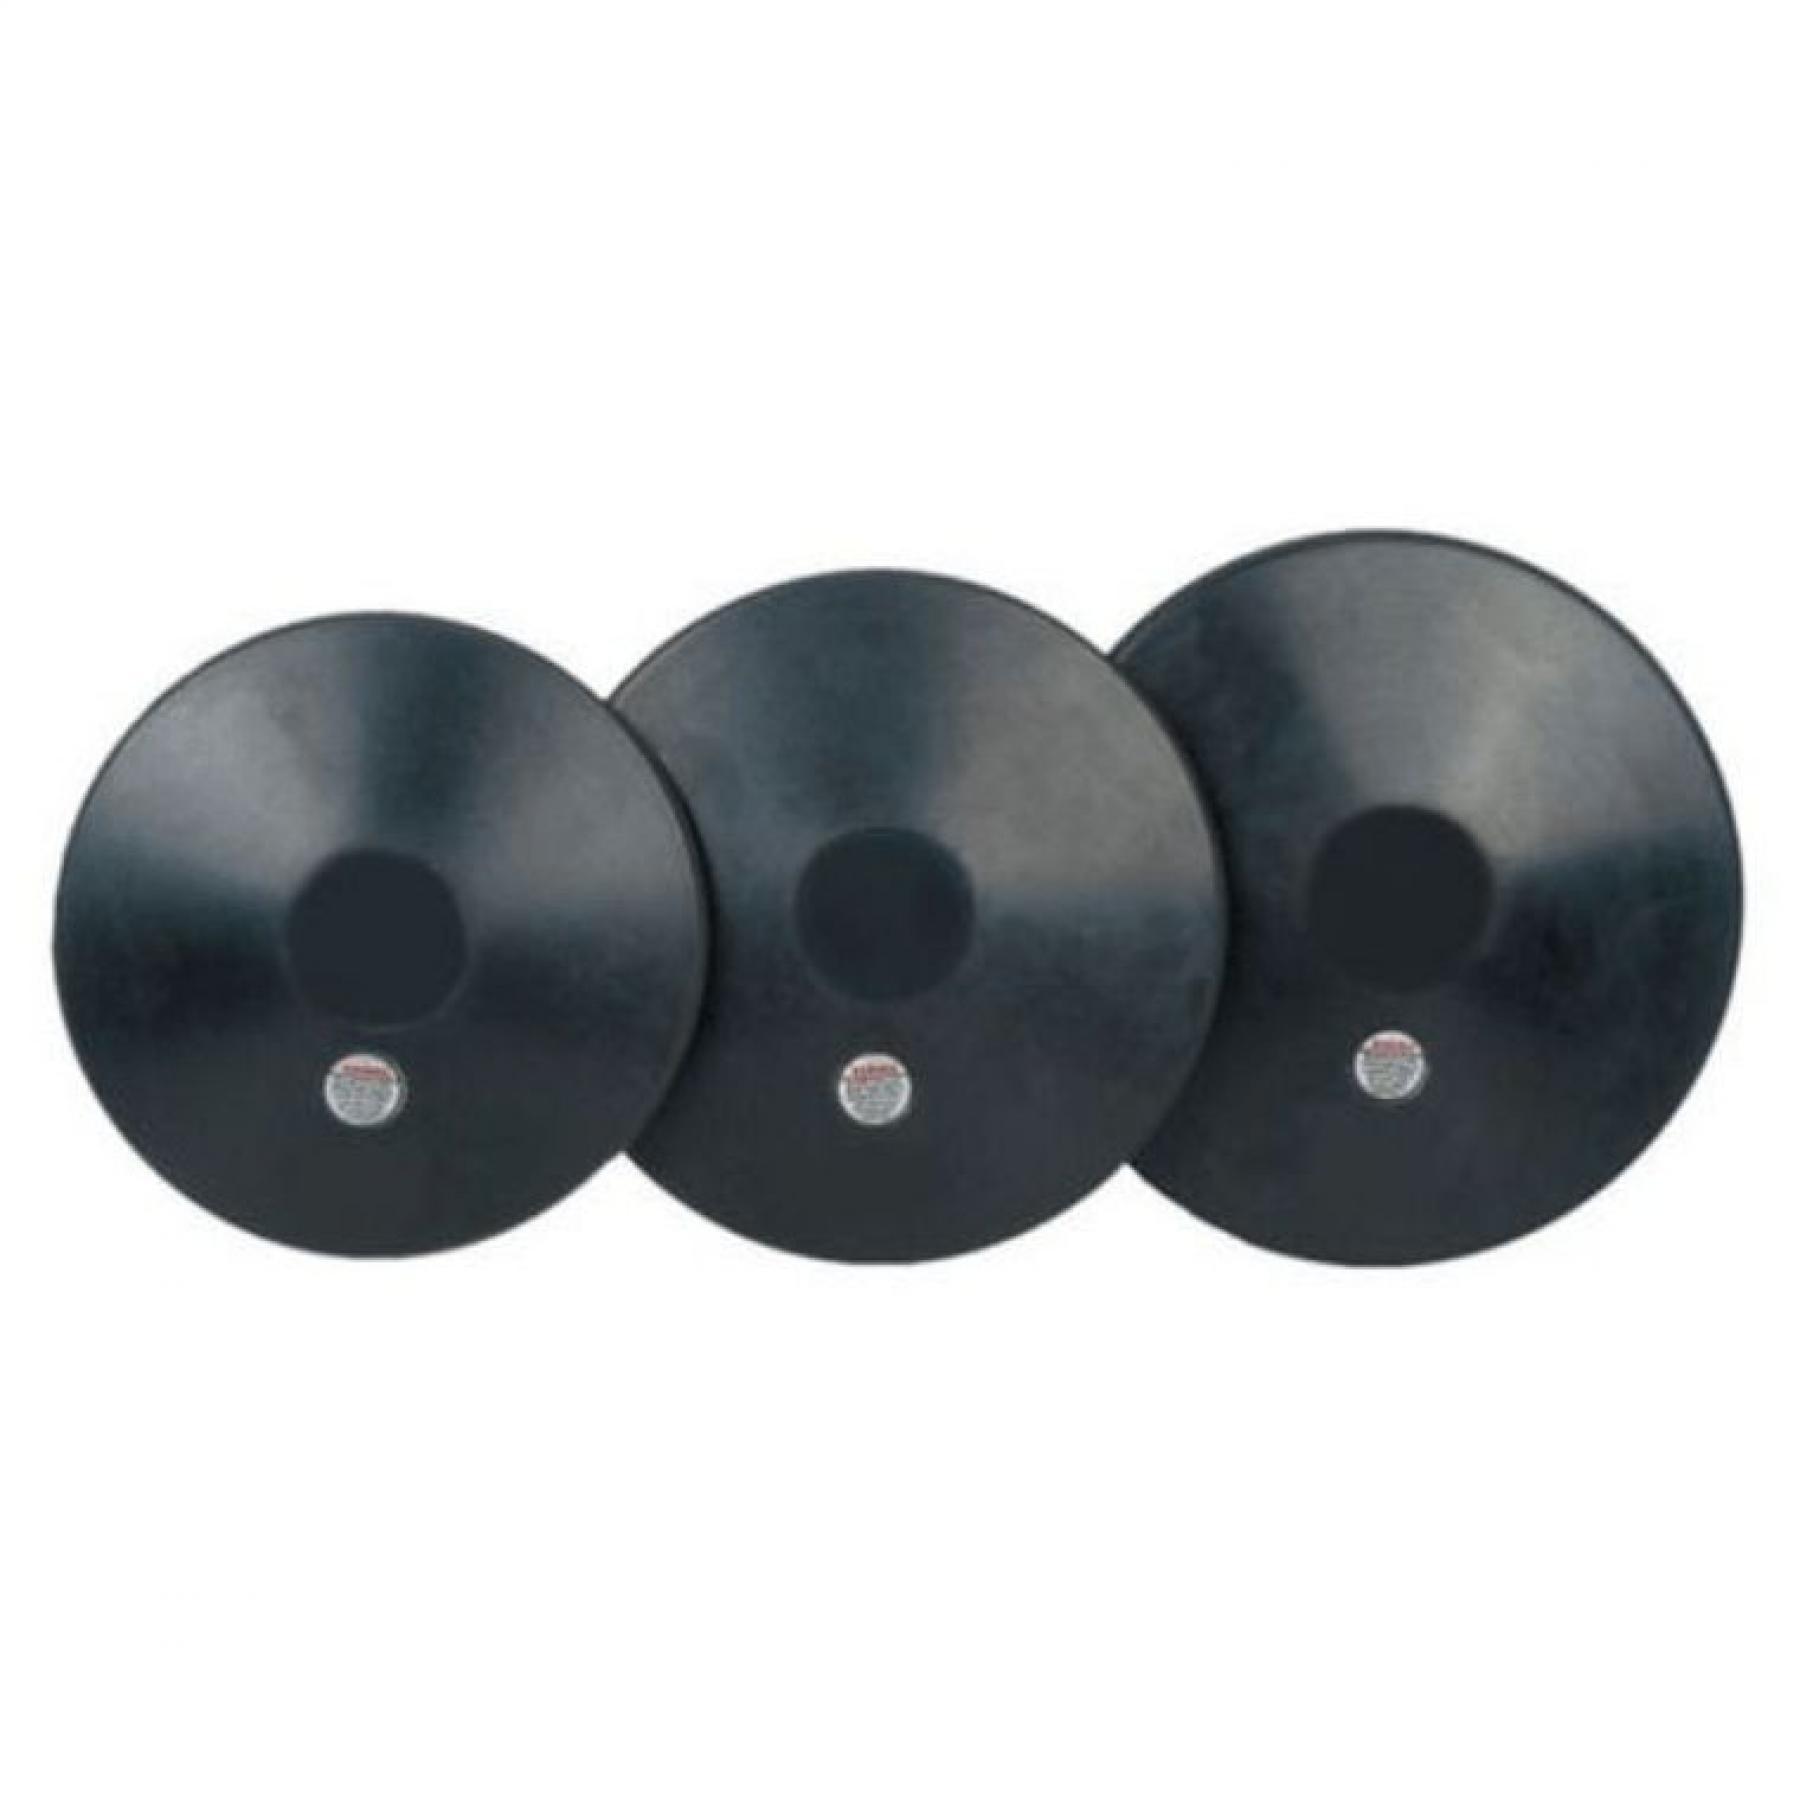 Discus Rubber 1kg